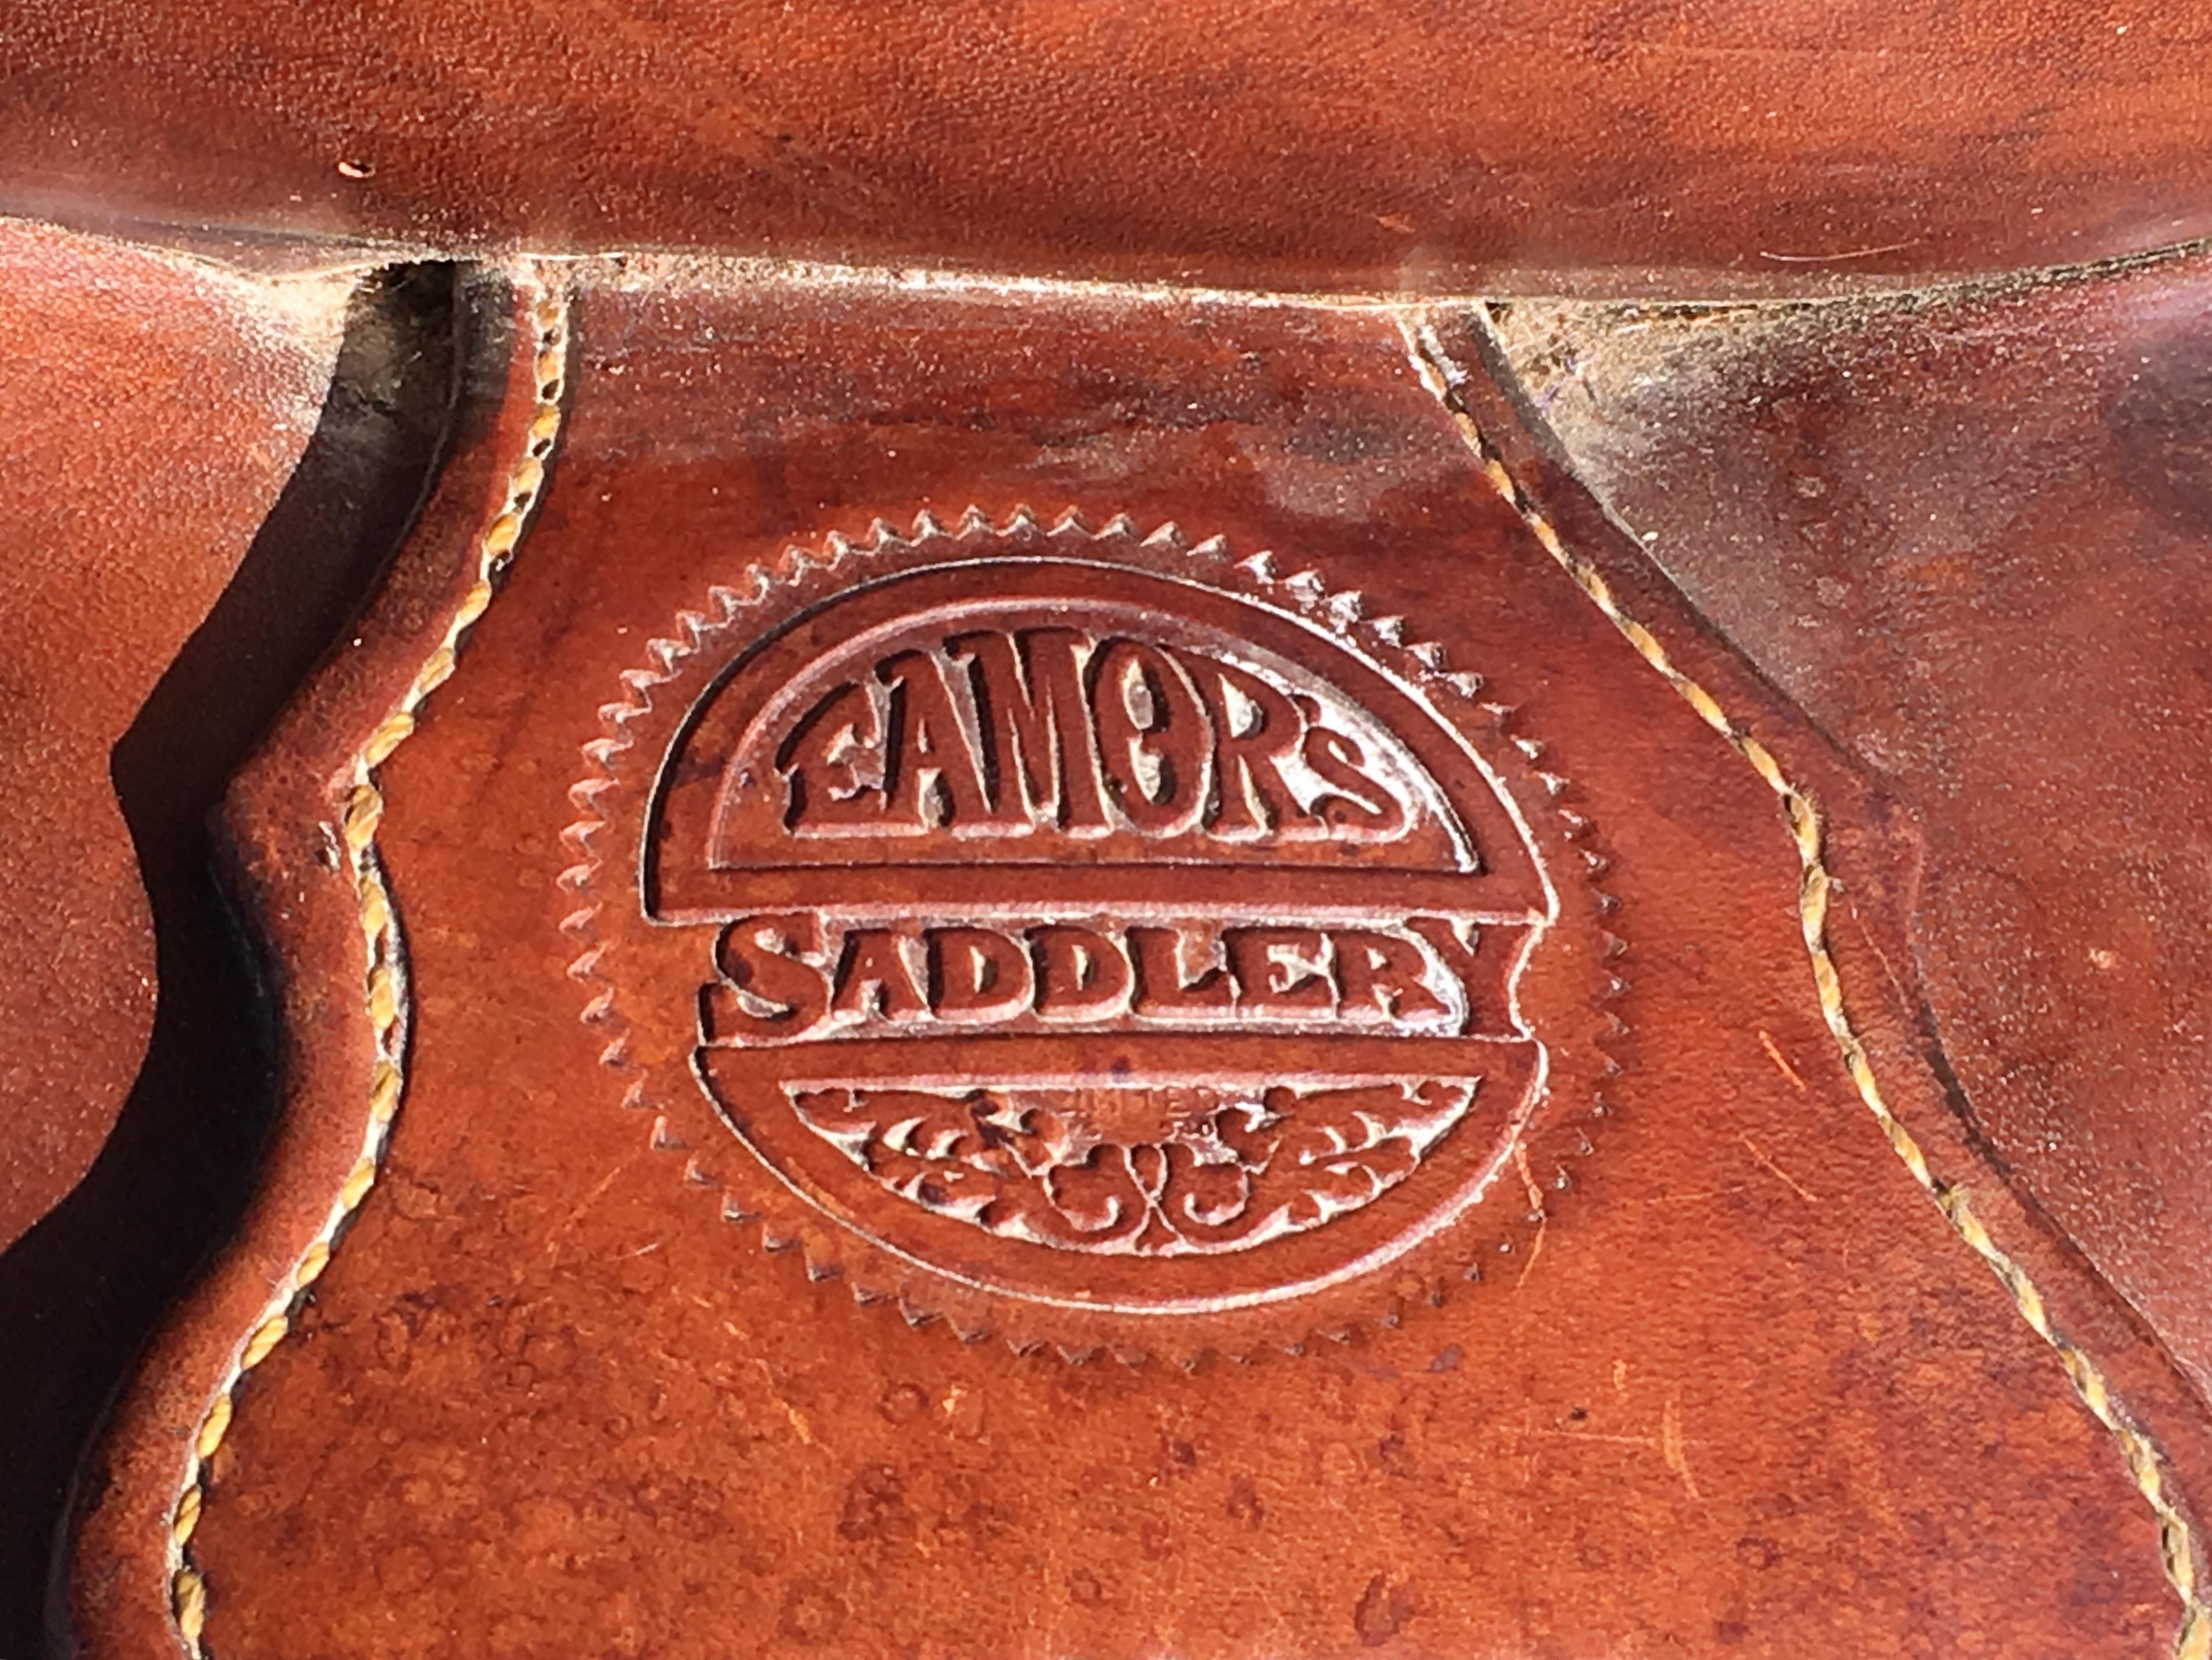 Eamor's Saddle 2